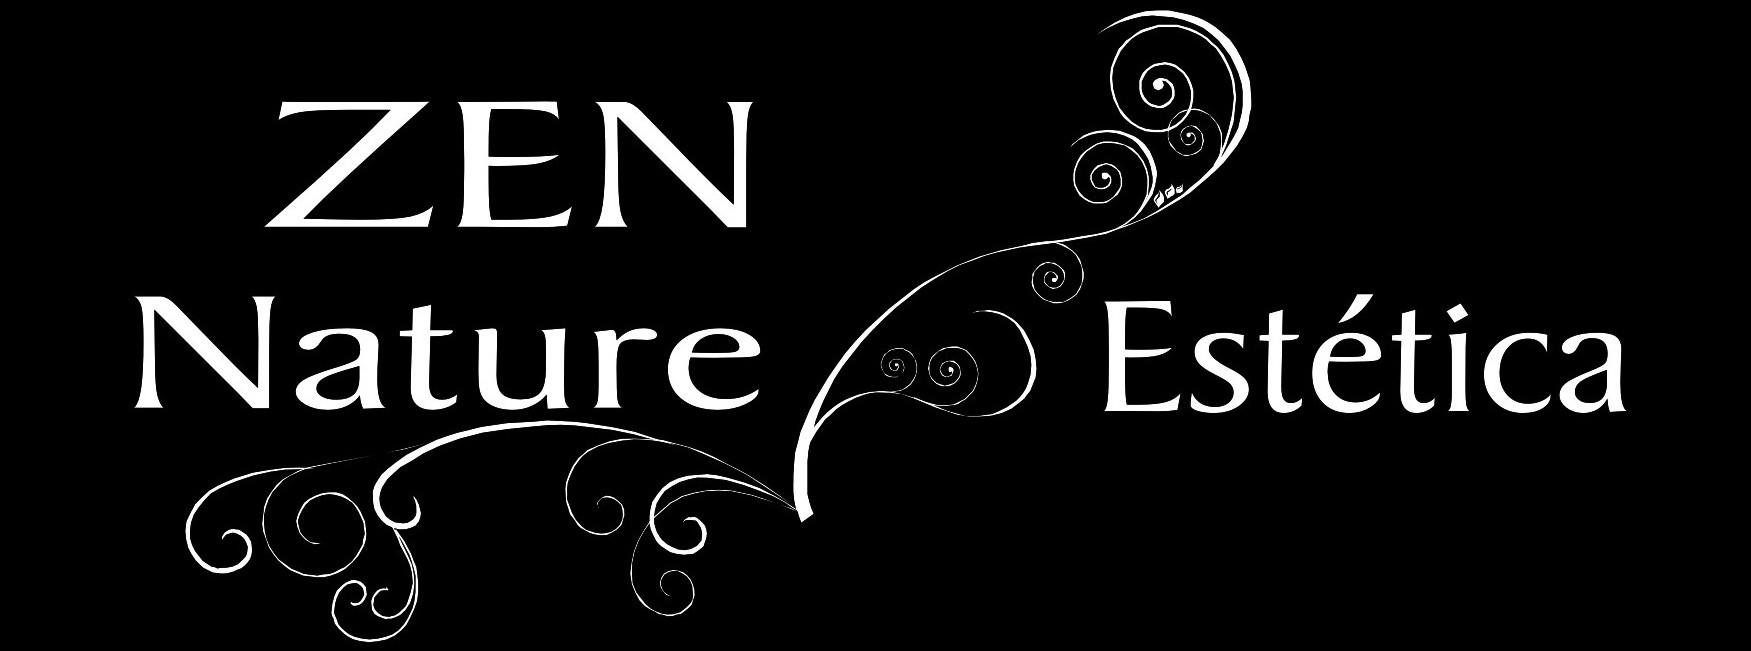 Zen Nature Estética